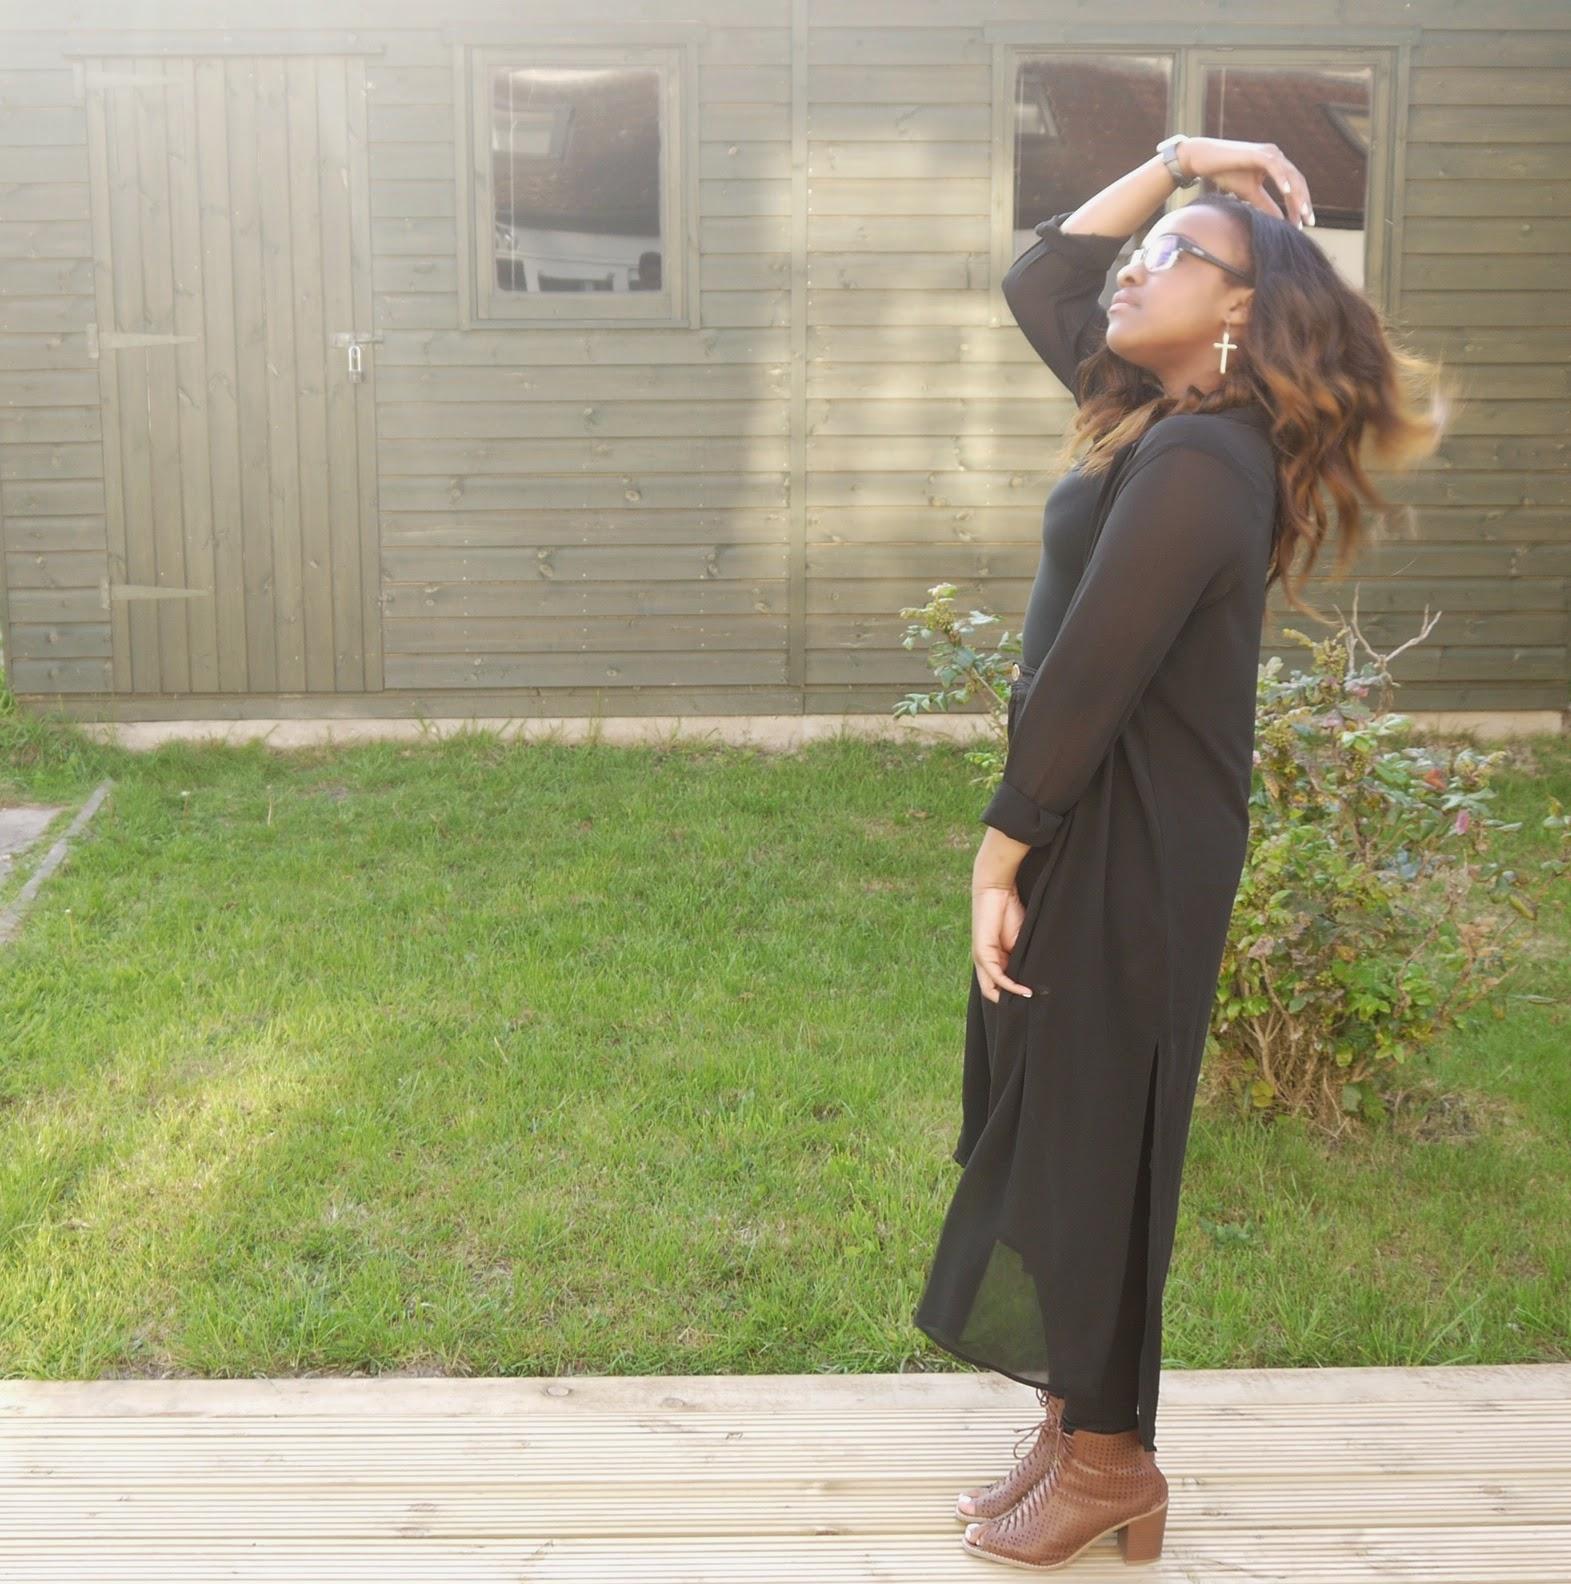 long duster kimono h&m black chiffon shirt river island black high waisted tube pants lace up forever 21 peep toe block heels